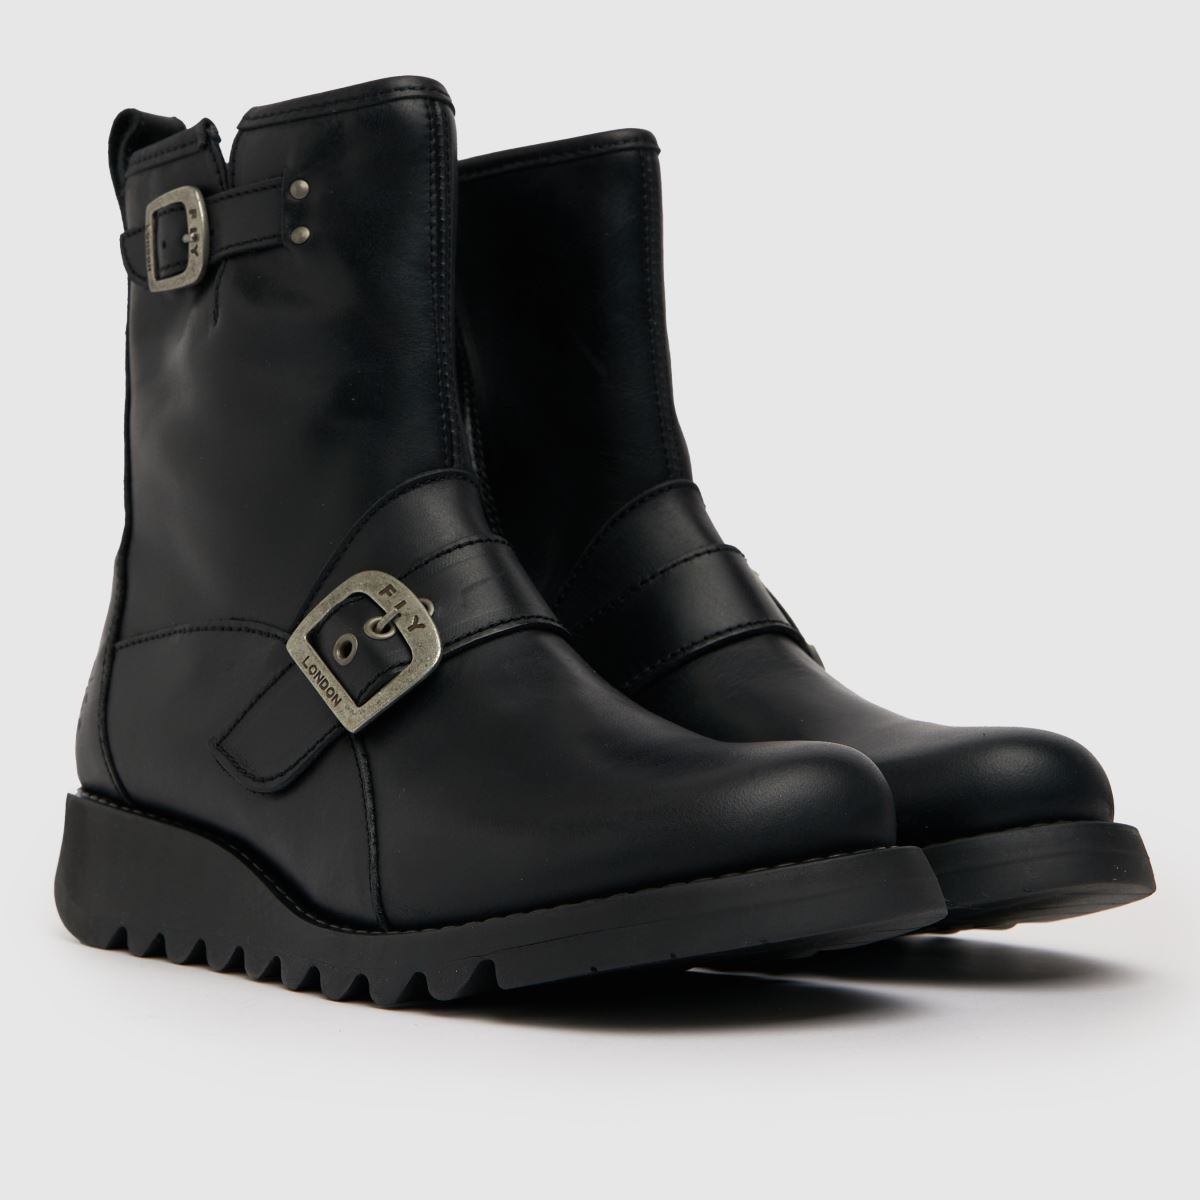 Damen Schwarz fly london Same Boots | schuh Gute Qualität beliebte Schuhe